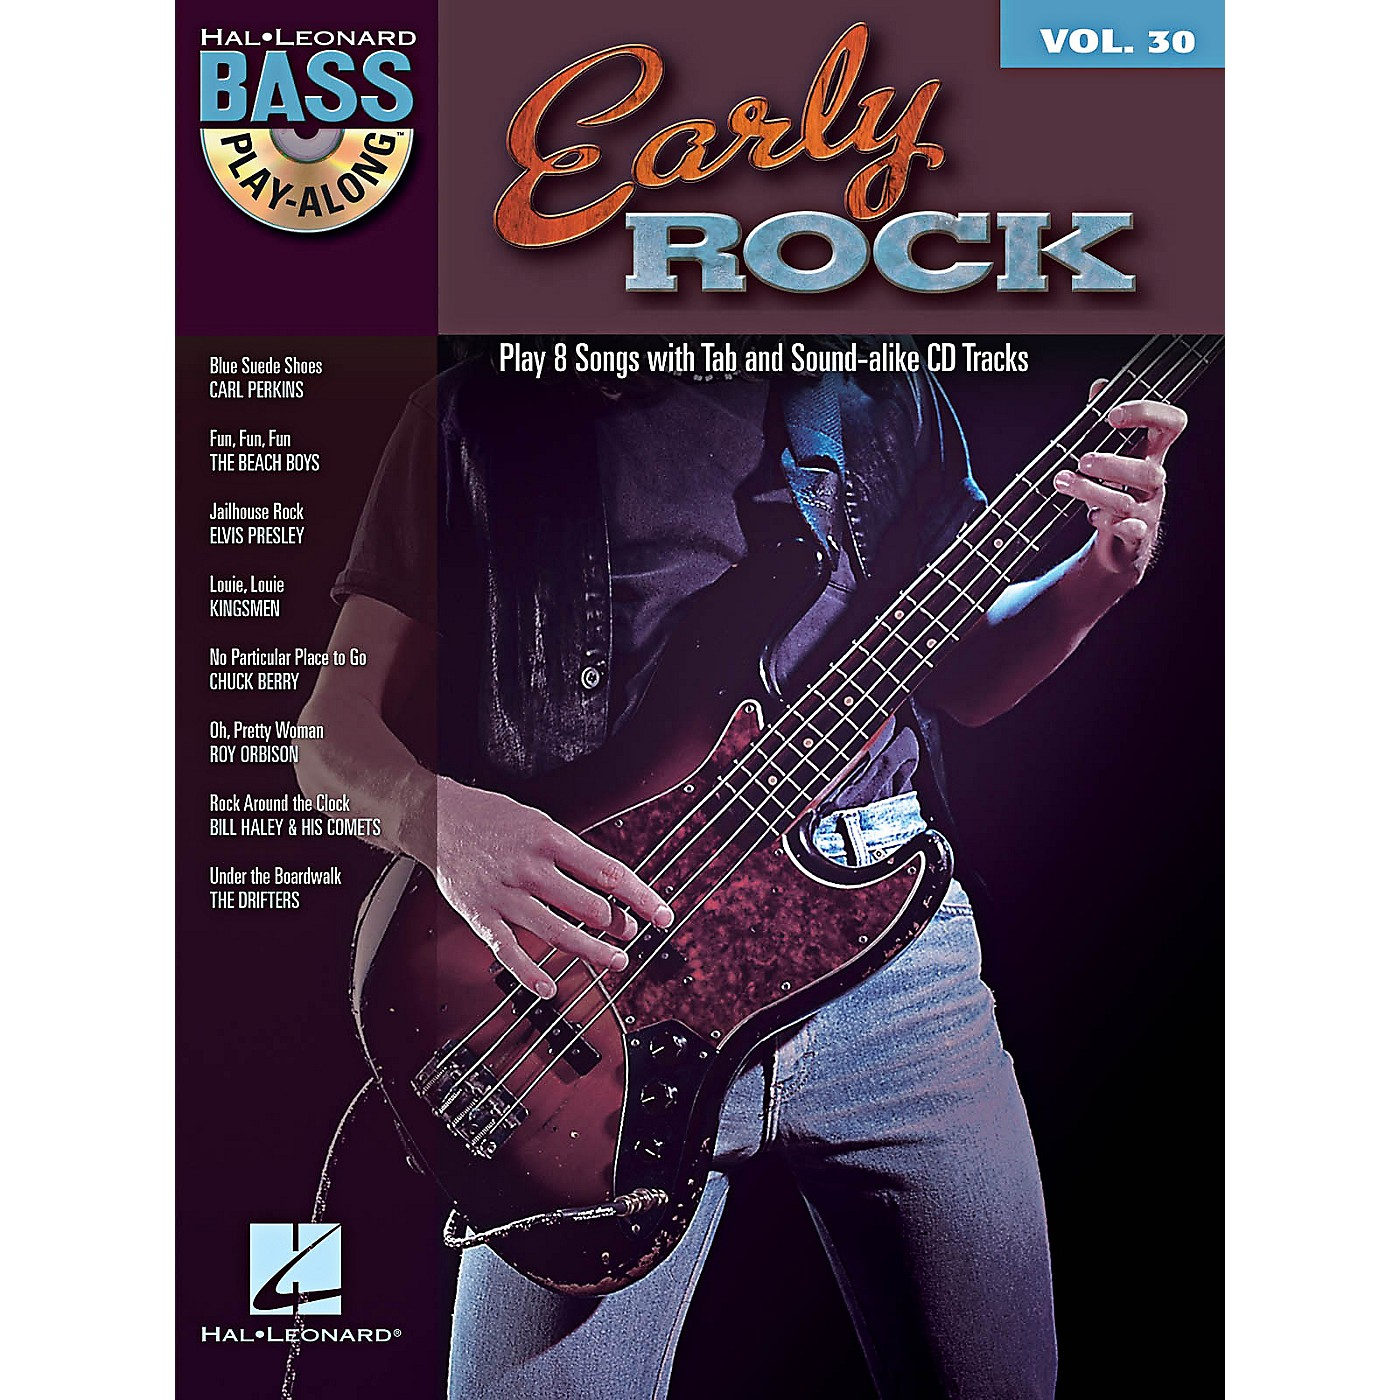 Hal Leonard Early Rock - Bass Play-Along Series Volume 30 Book/CD thumbnail